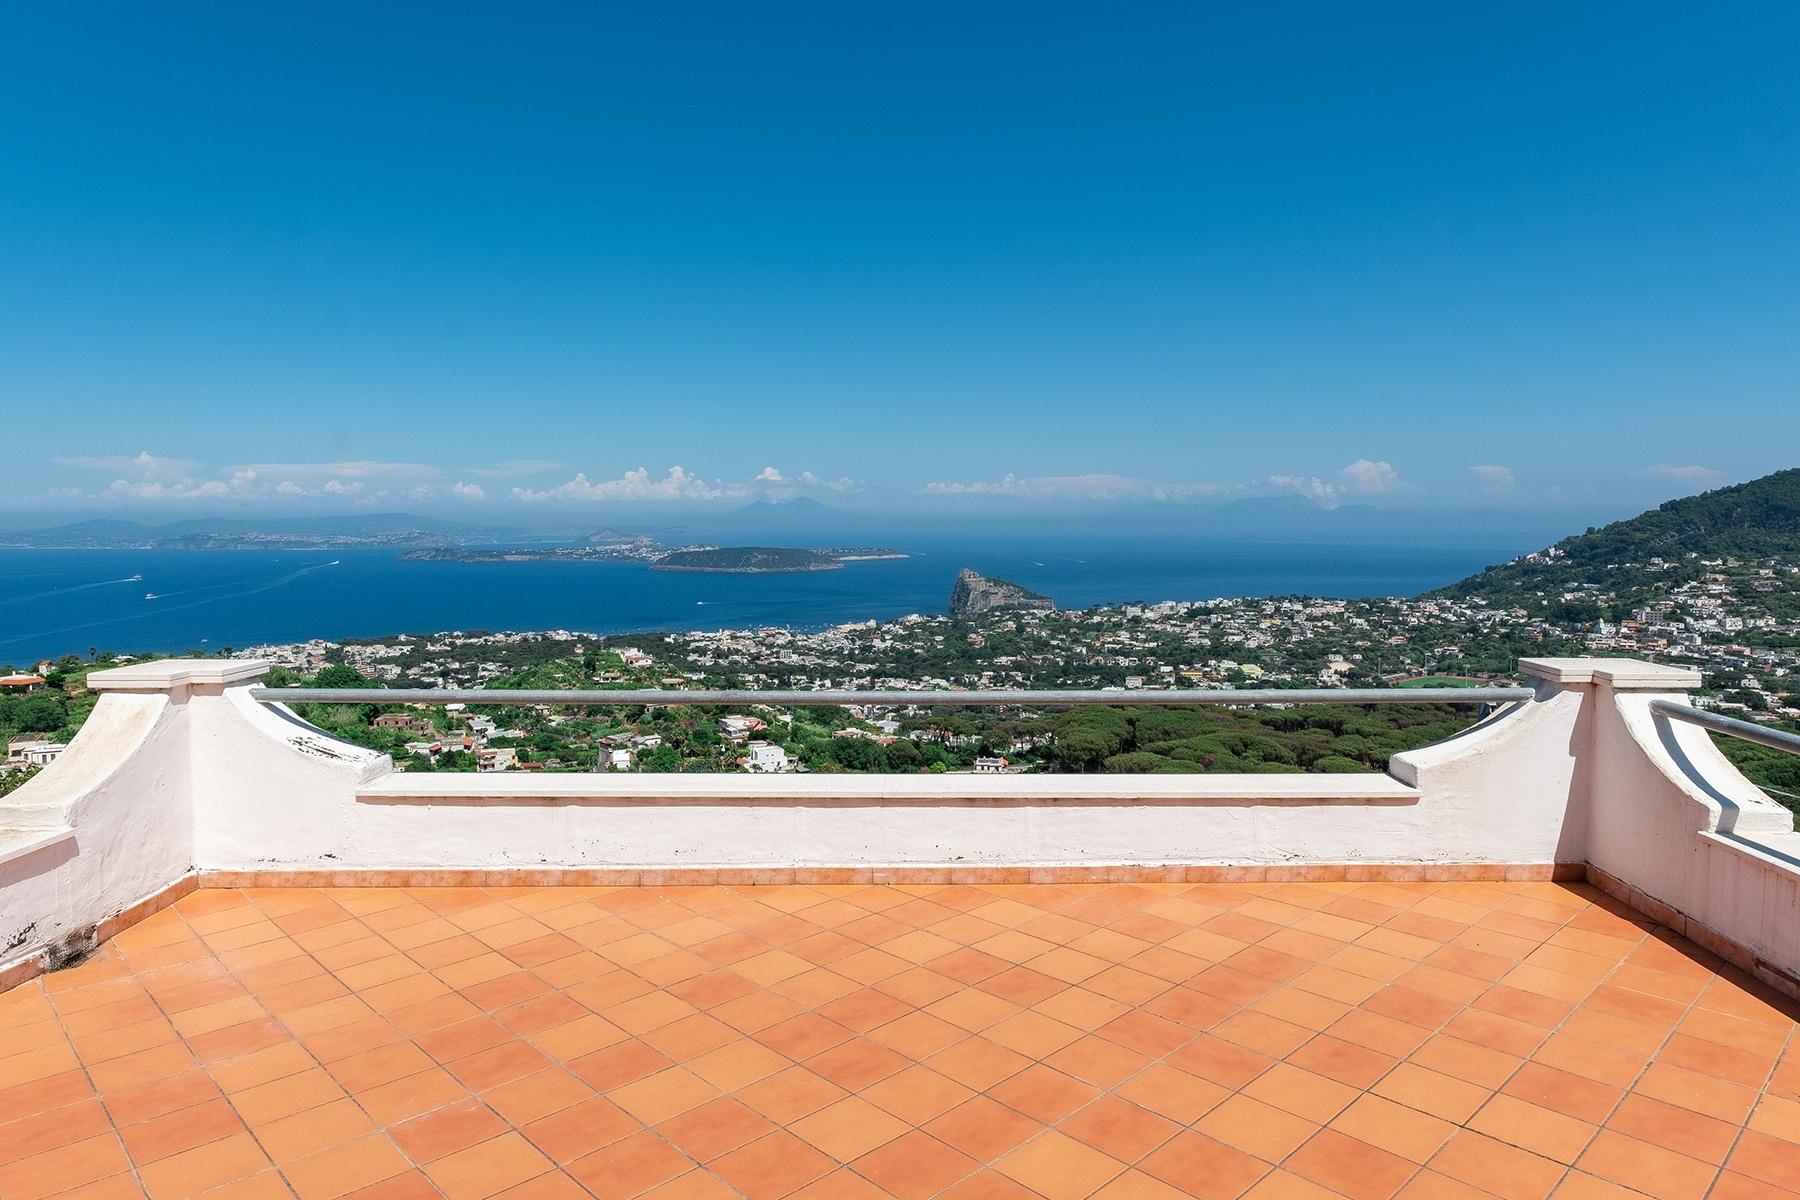 Villa in Vendita a Ischia: 5 locali, 138 mq - Foto 12